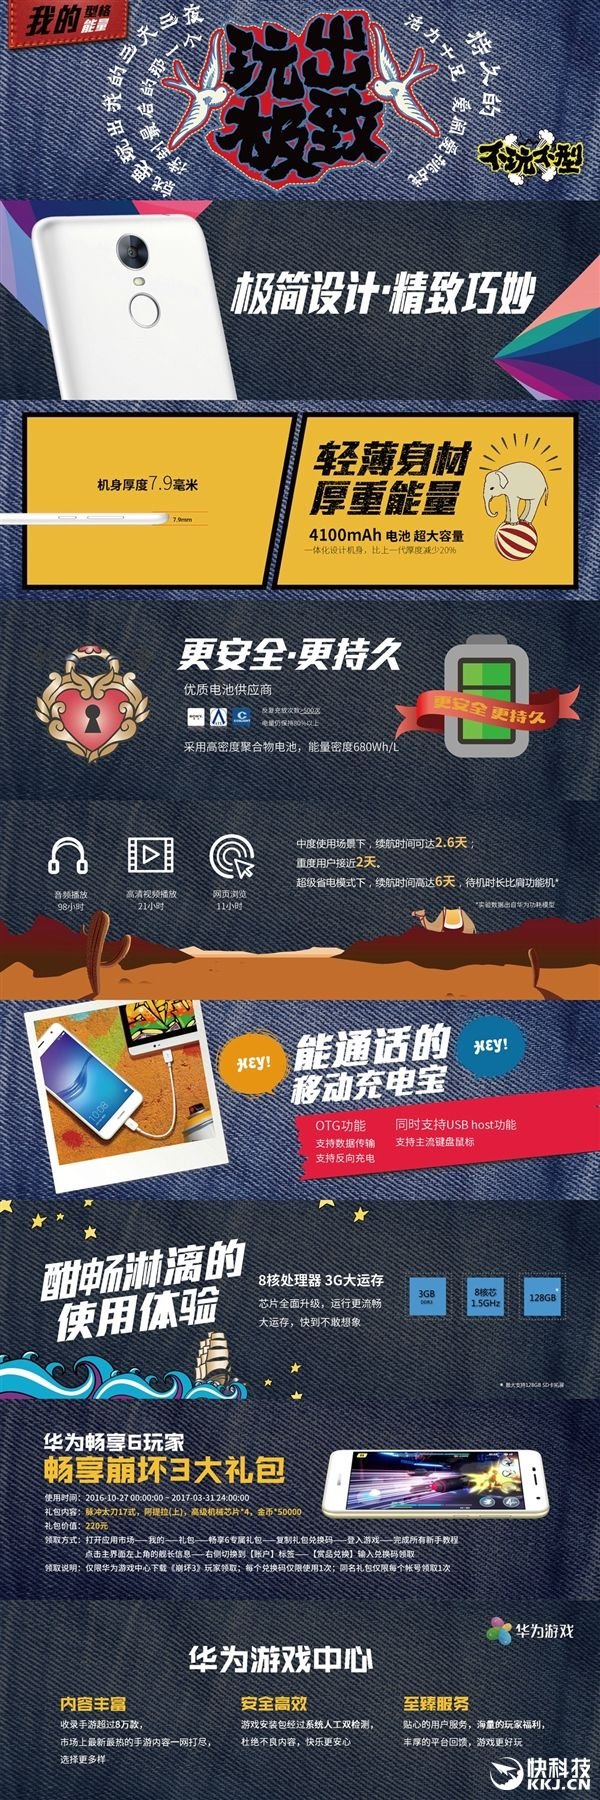 Huawei Enjoy 6 - гибрид Meizu M3s и Xiaomi Redmi 3S с заоблачным ценником – фото 2